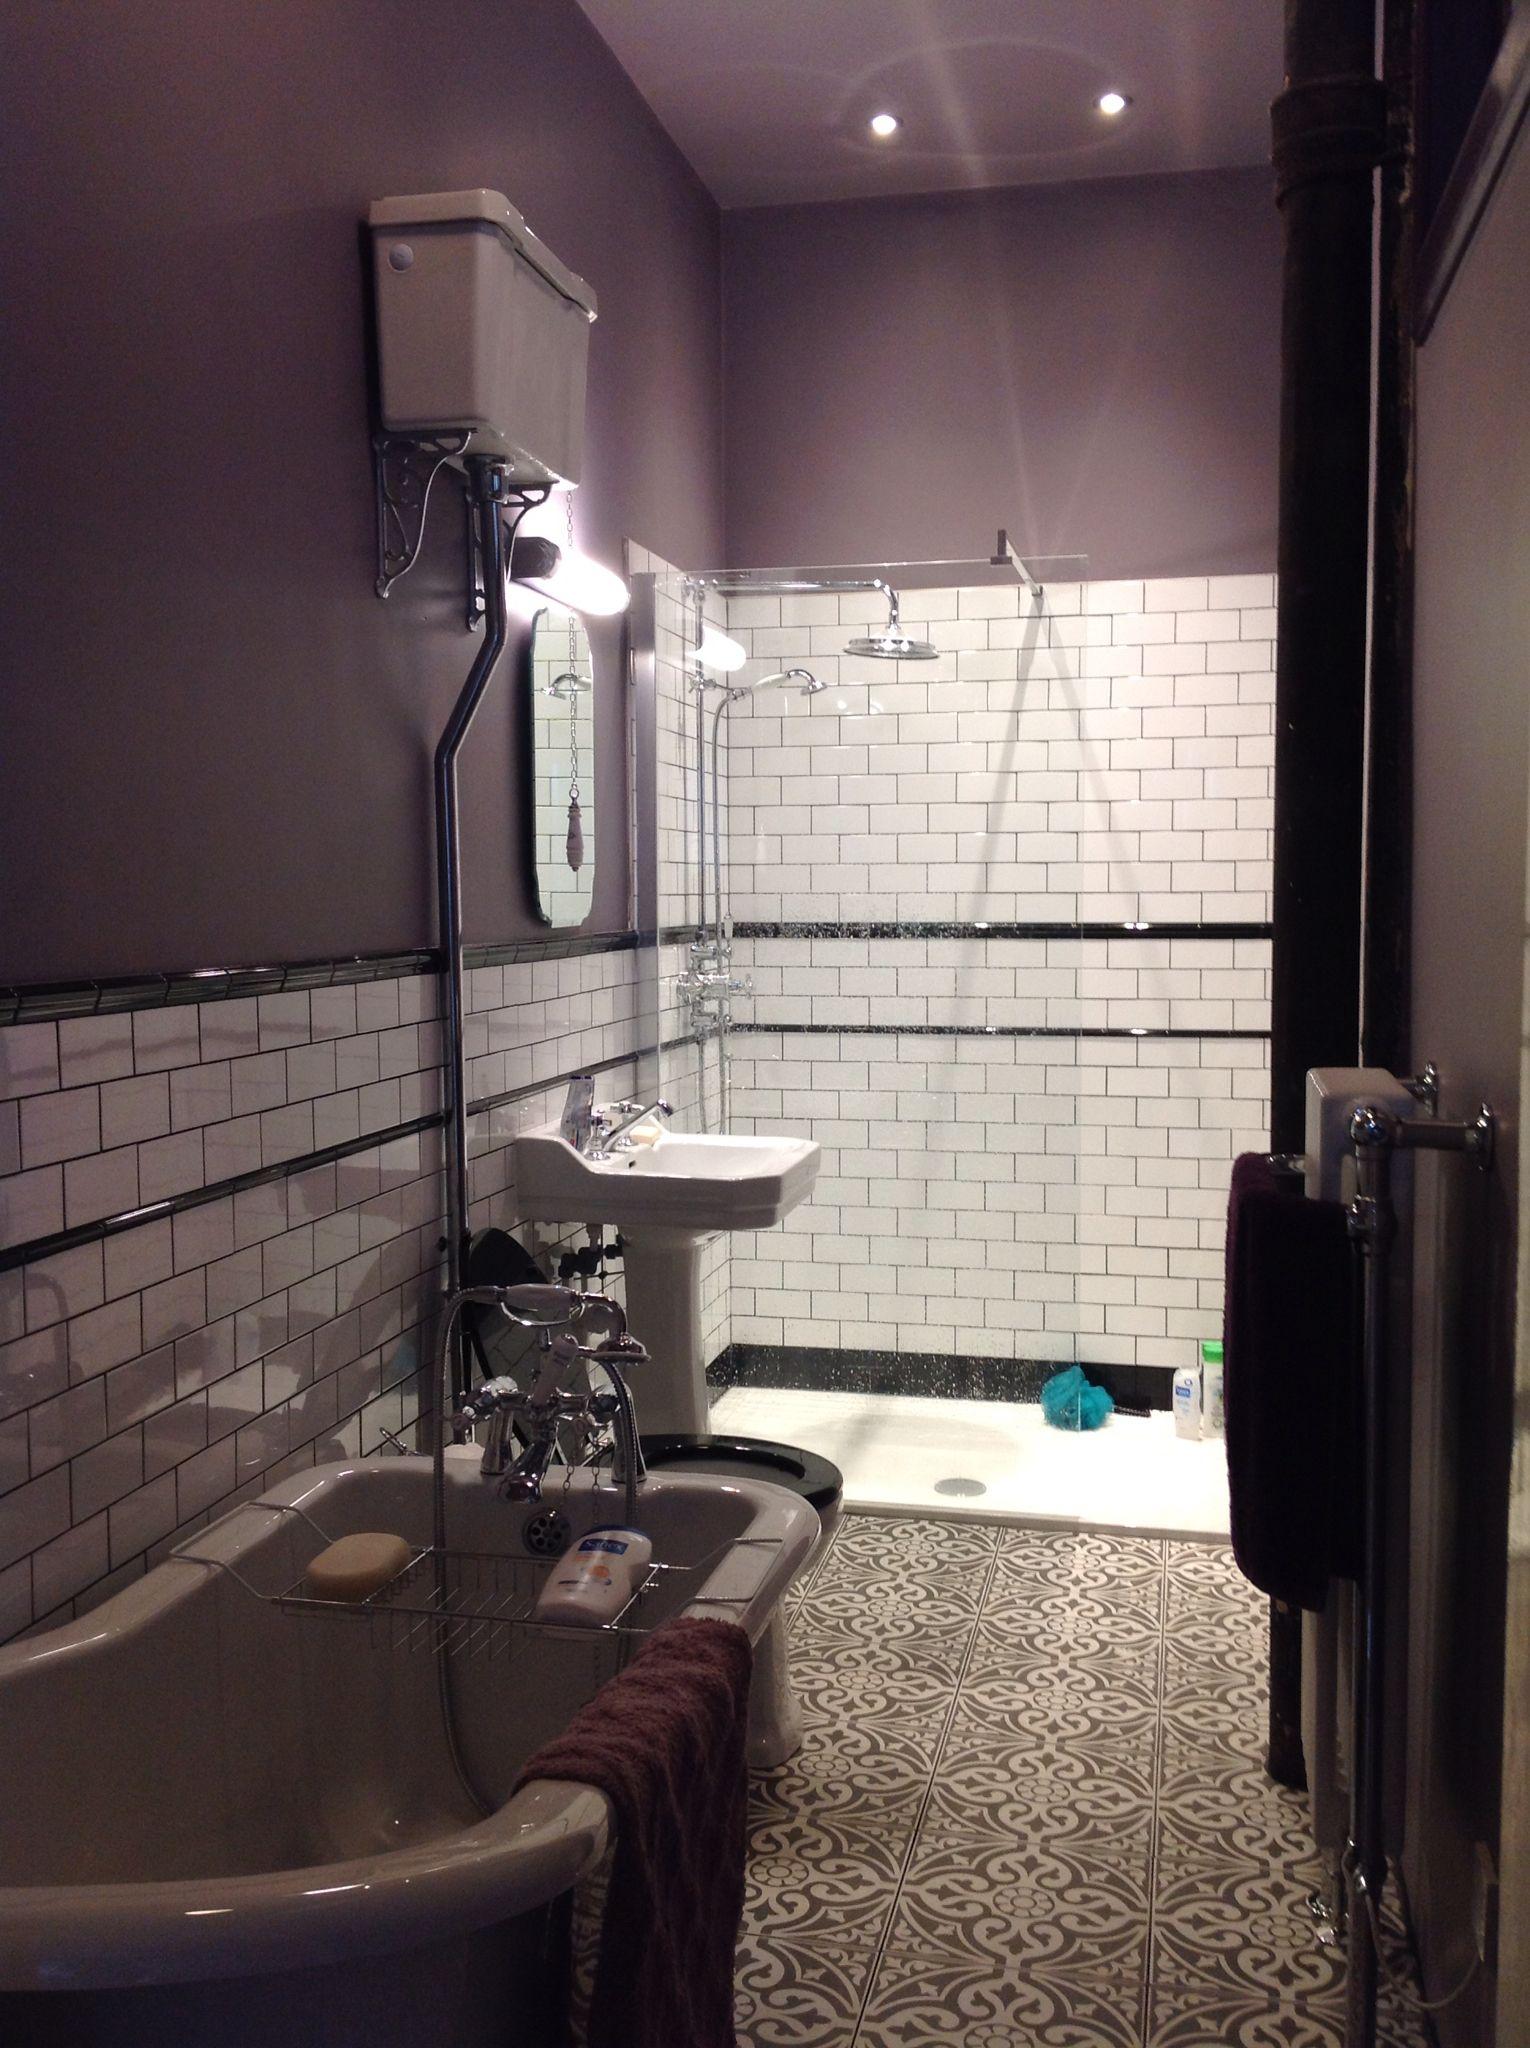 Bathroom Mirrors Glasgow Long Narrow An Extremely Long And Narrow Bathroom In A Top Floor